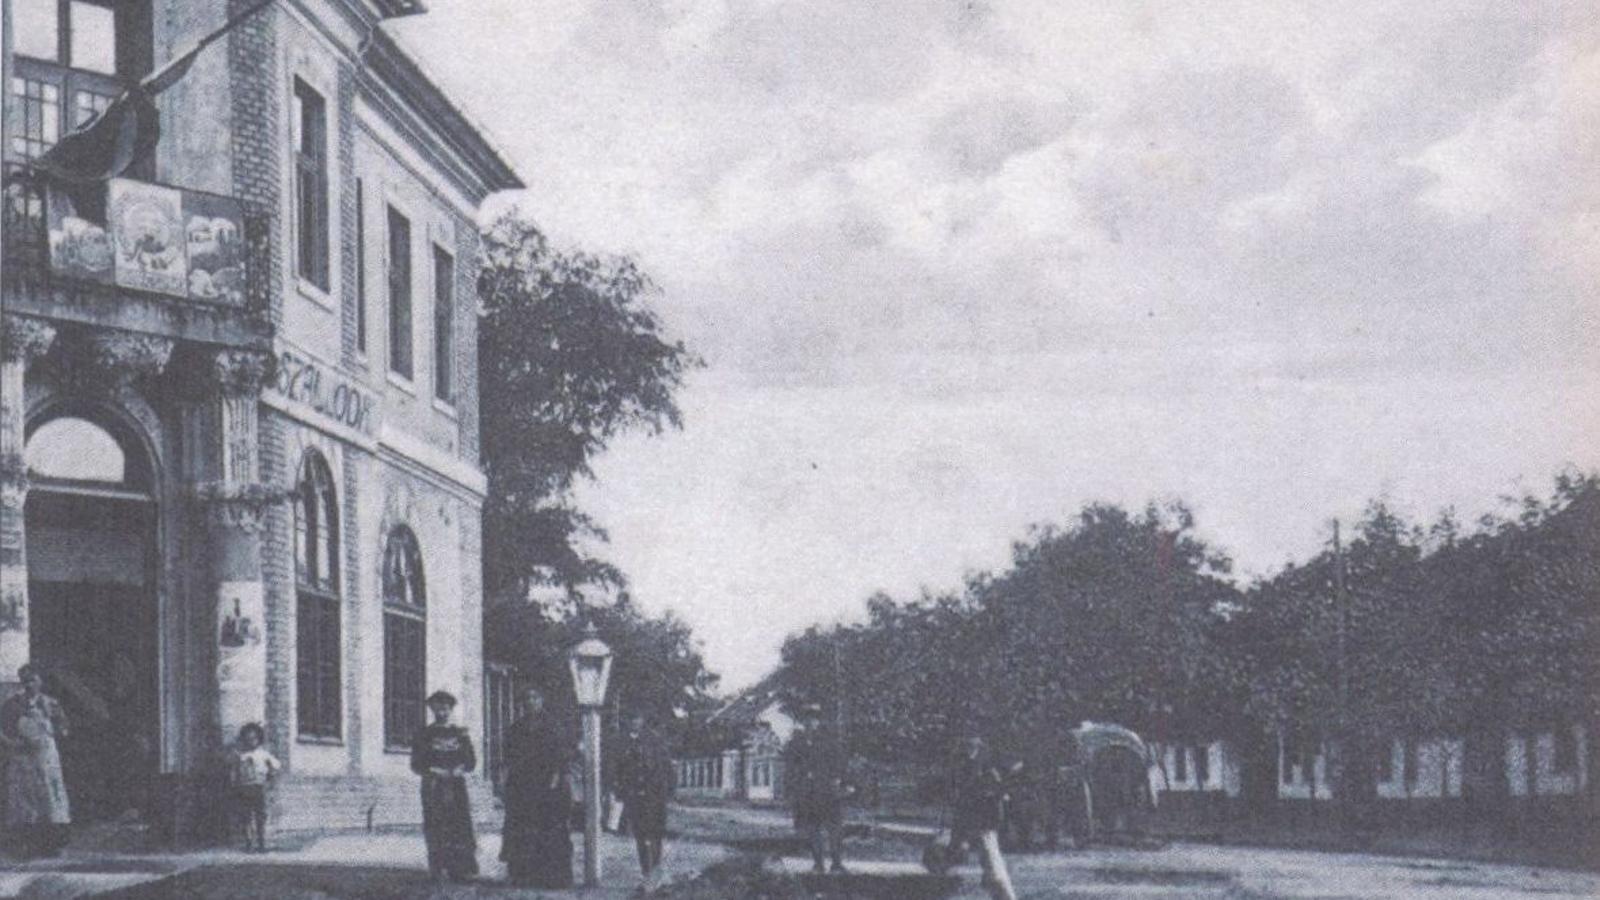 El carrer de Cinkota on es va criar György Silberstein, a Hongria